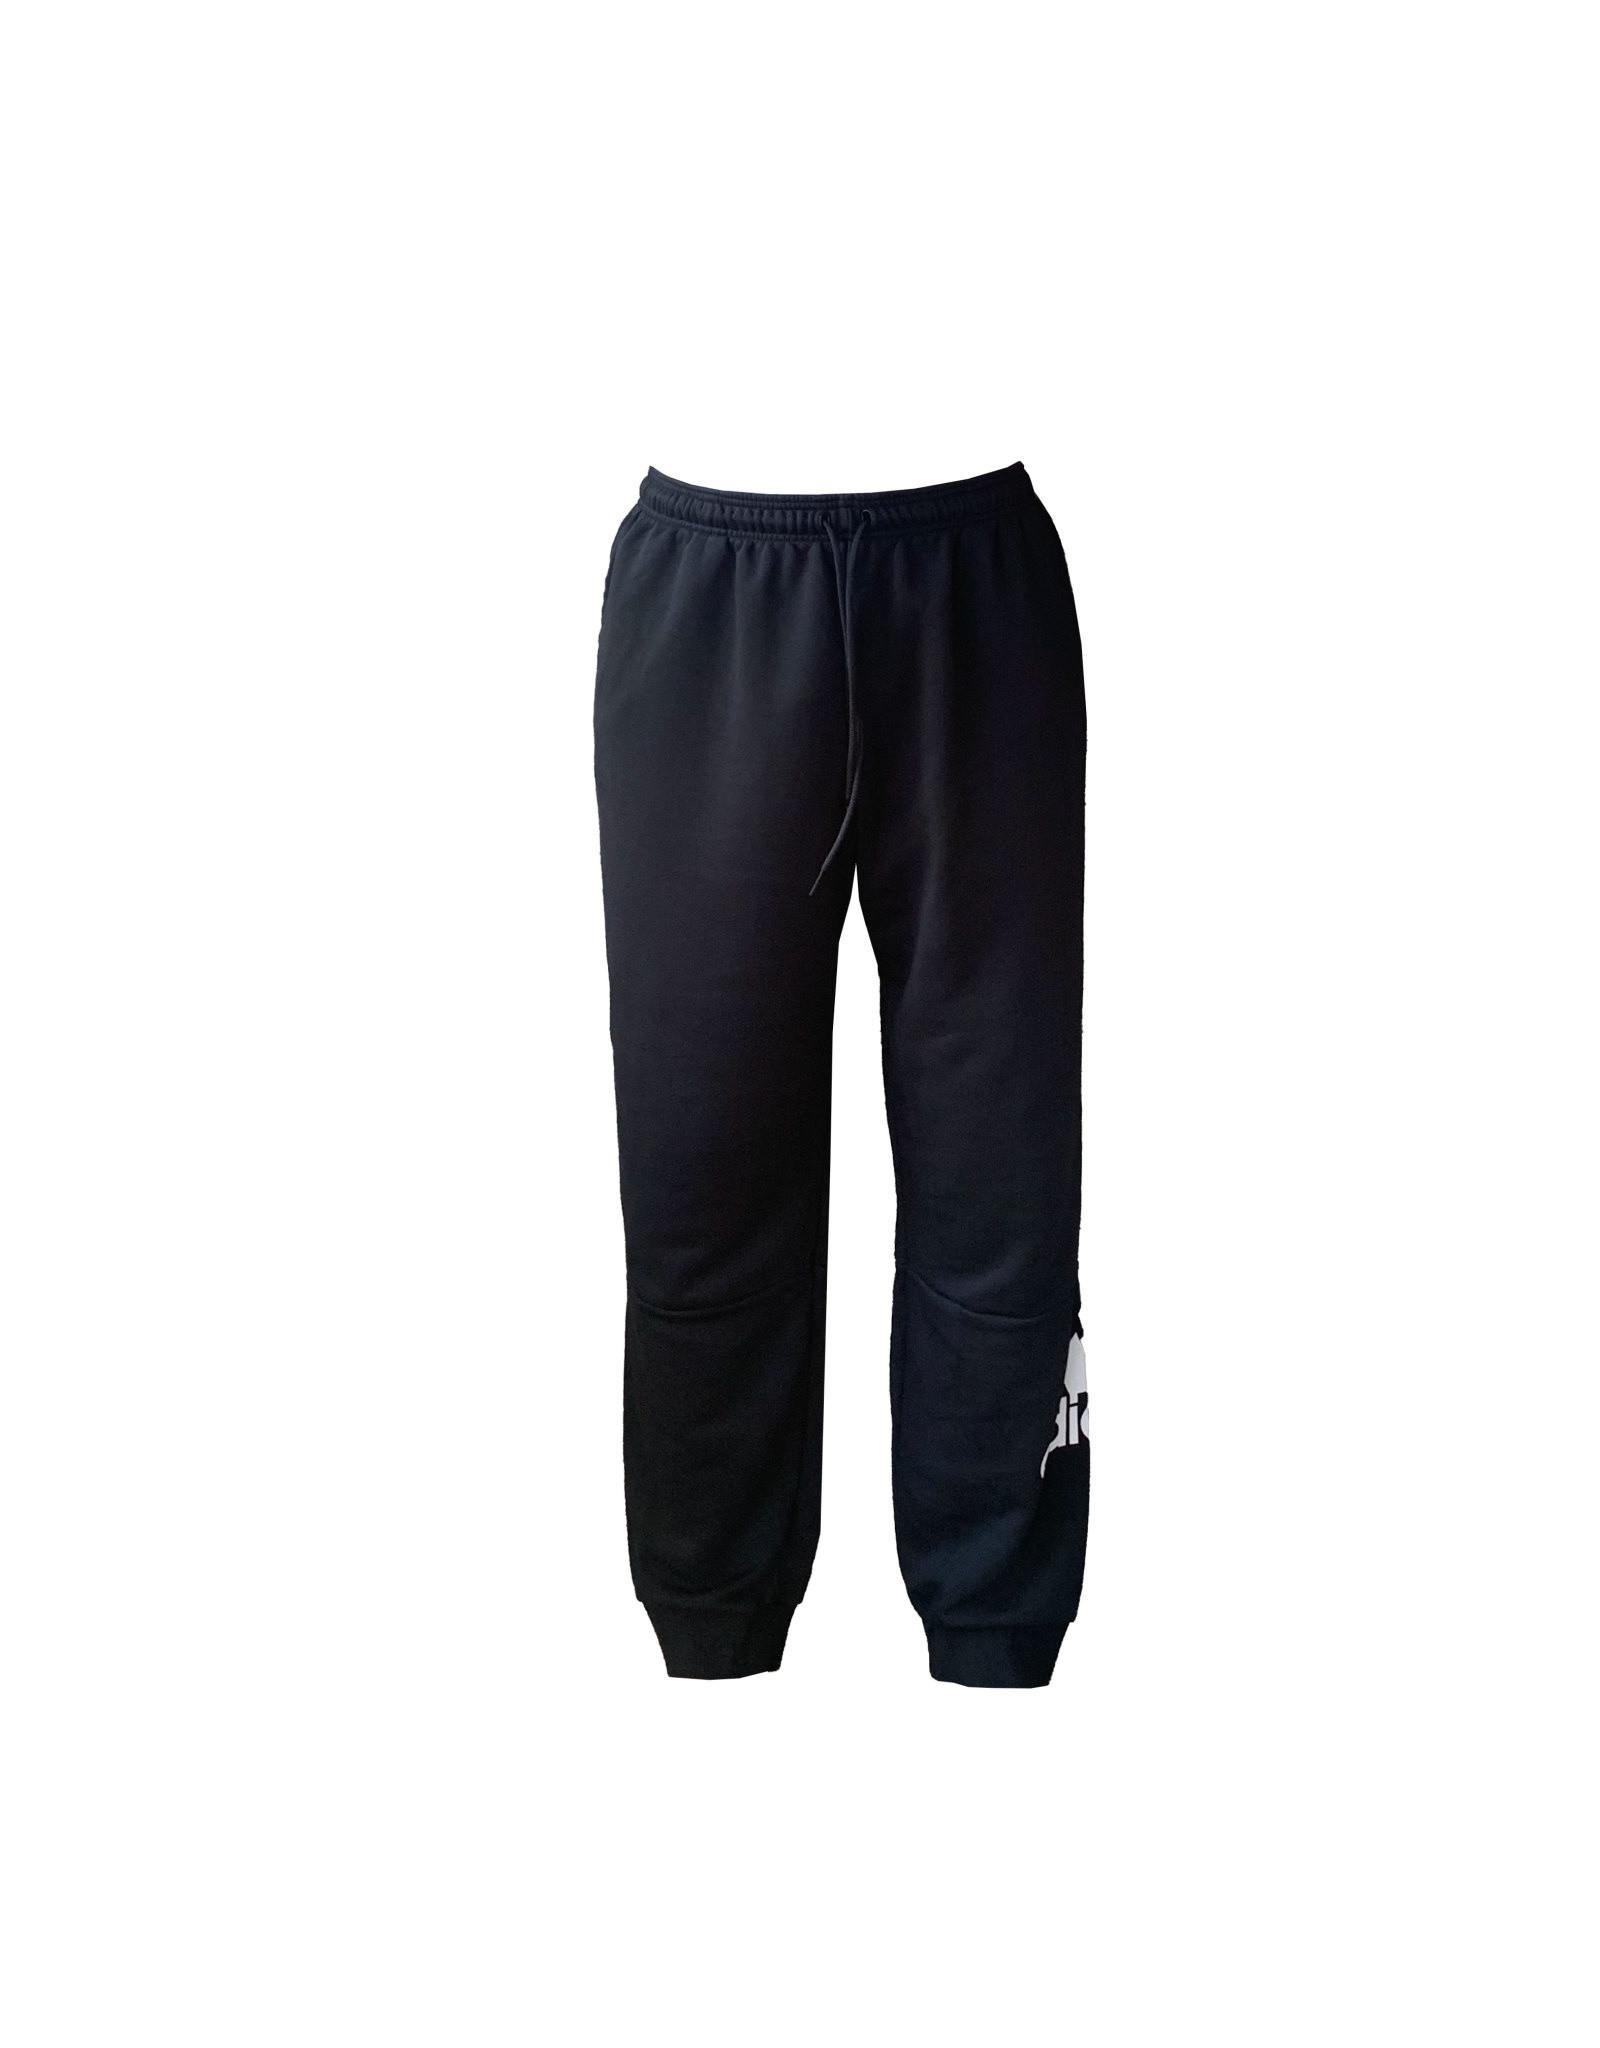 Adidas Adidas Men's  Fleece  Pants Size 2XL